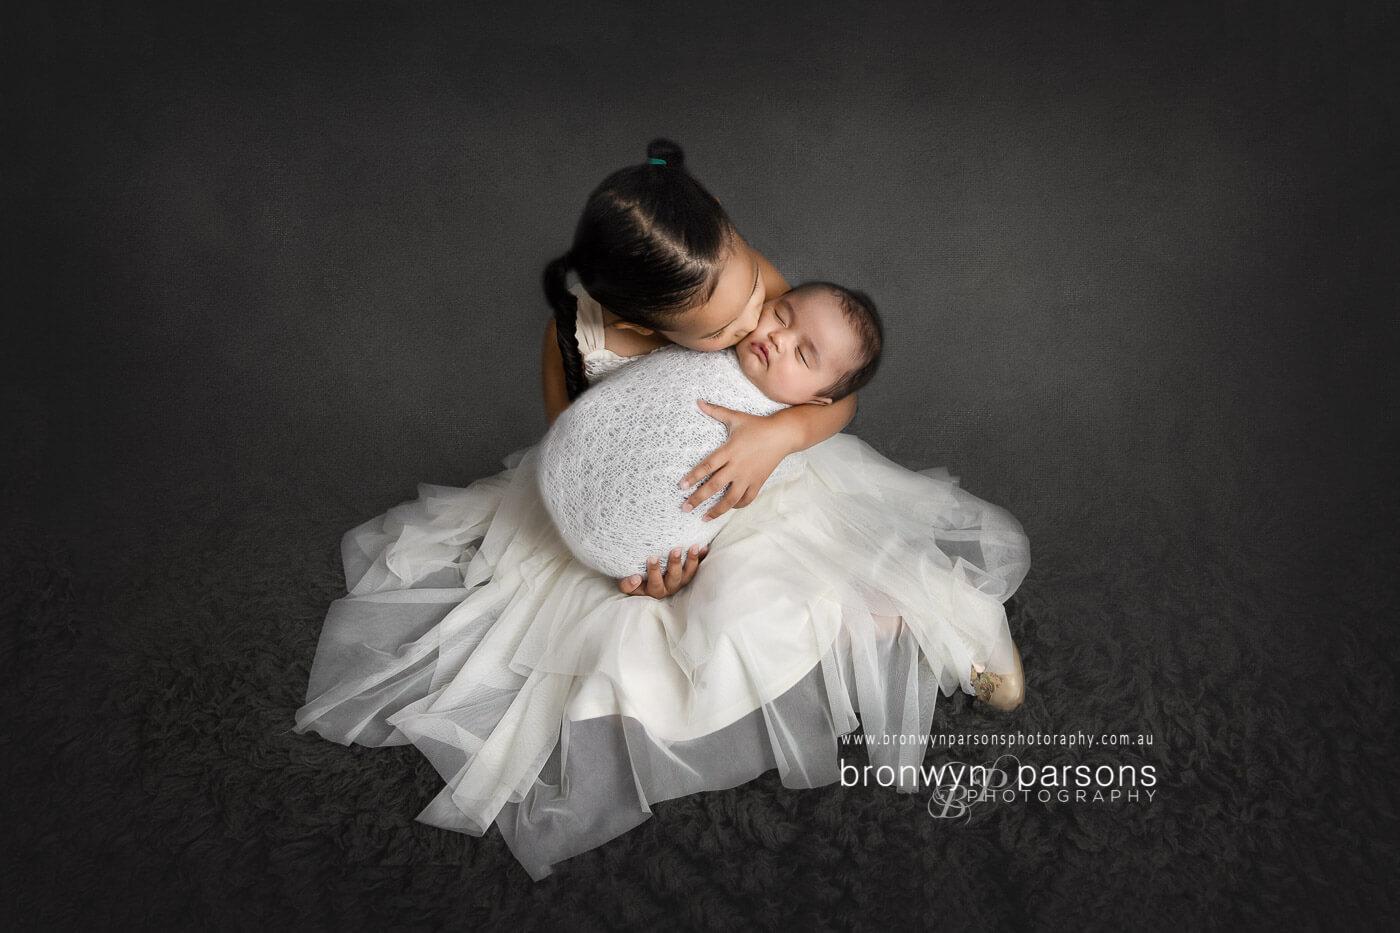 Newborn photography tips for preparing siblings